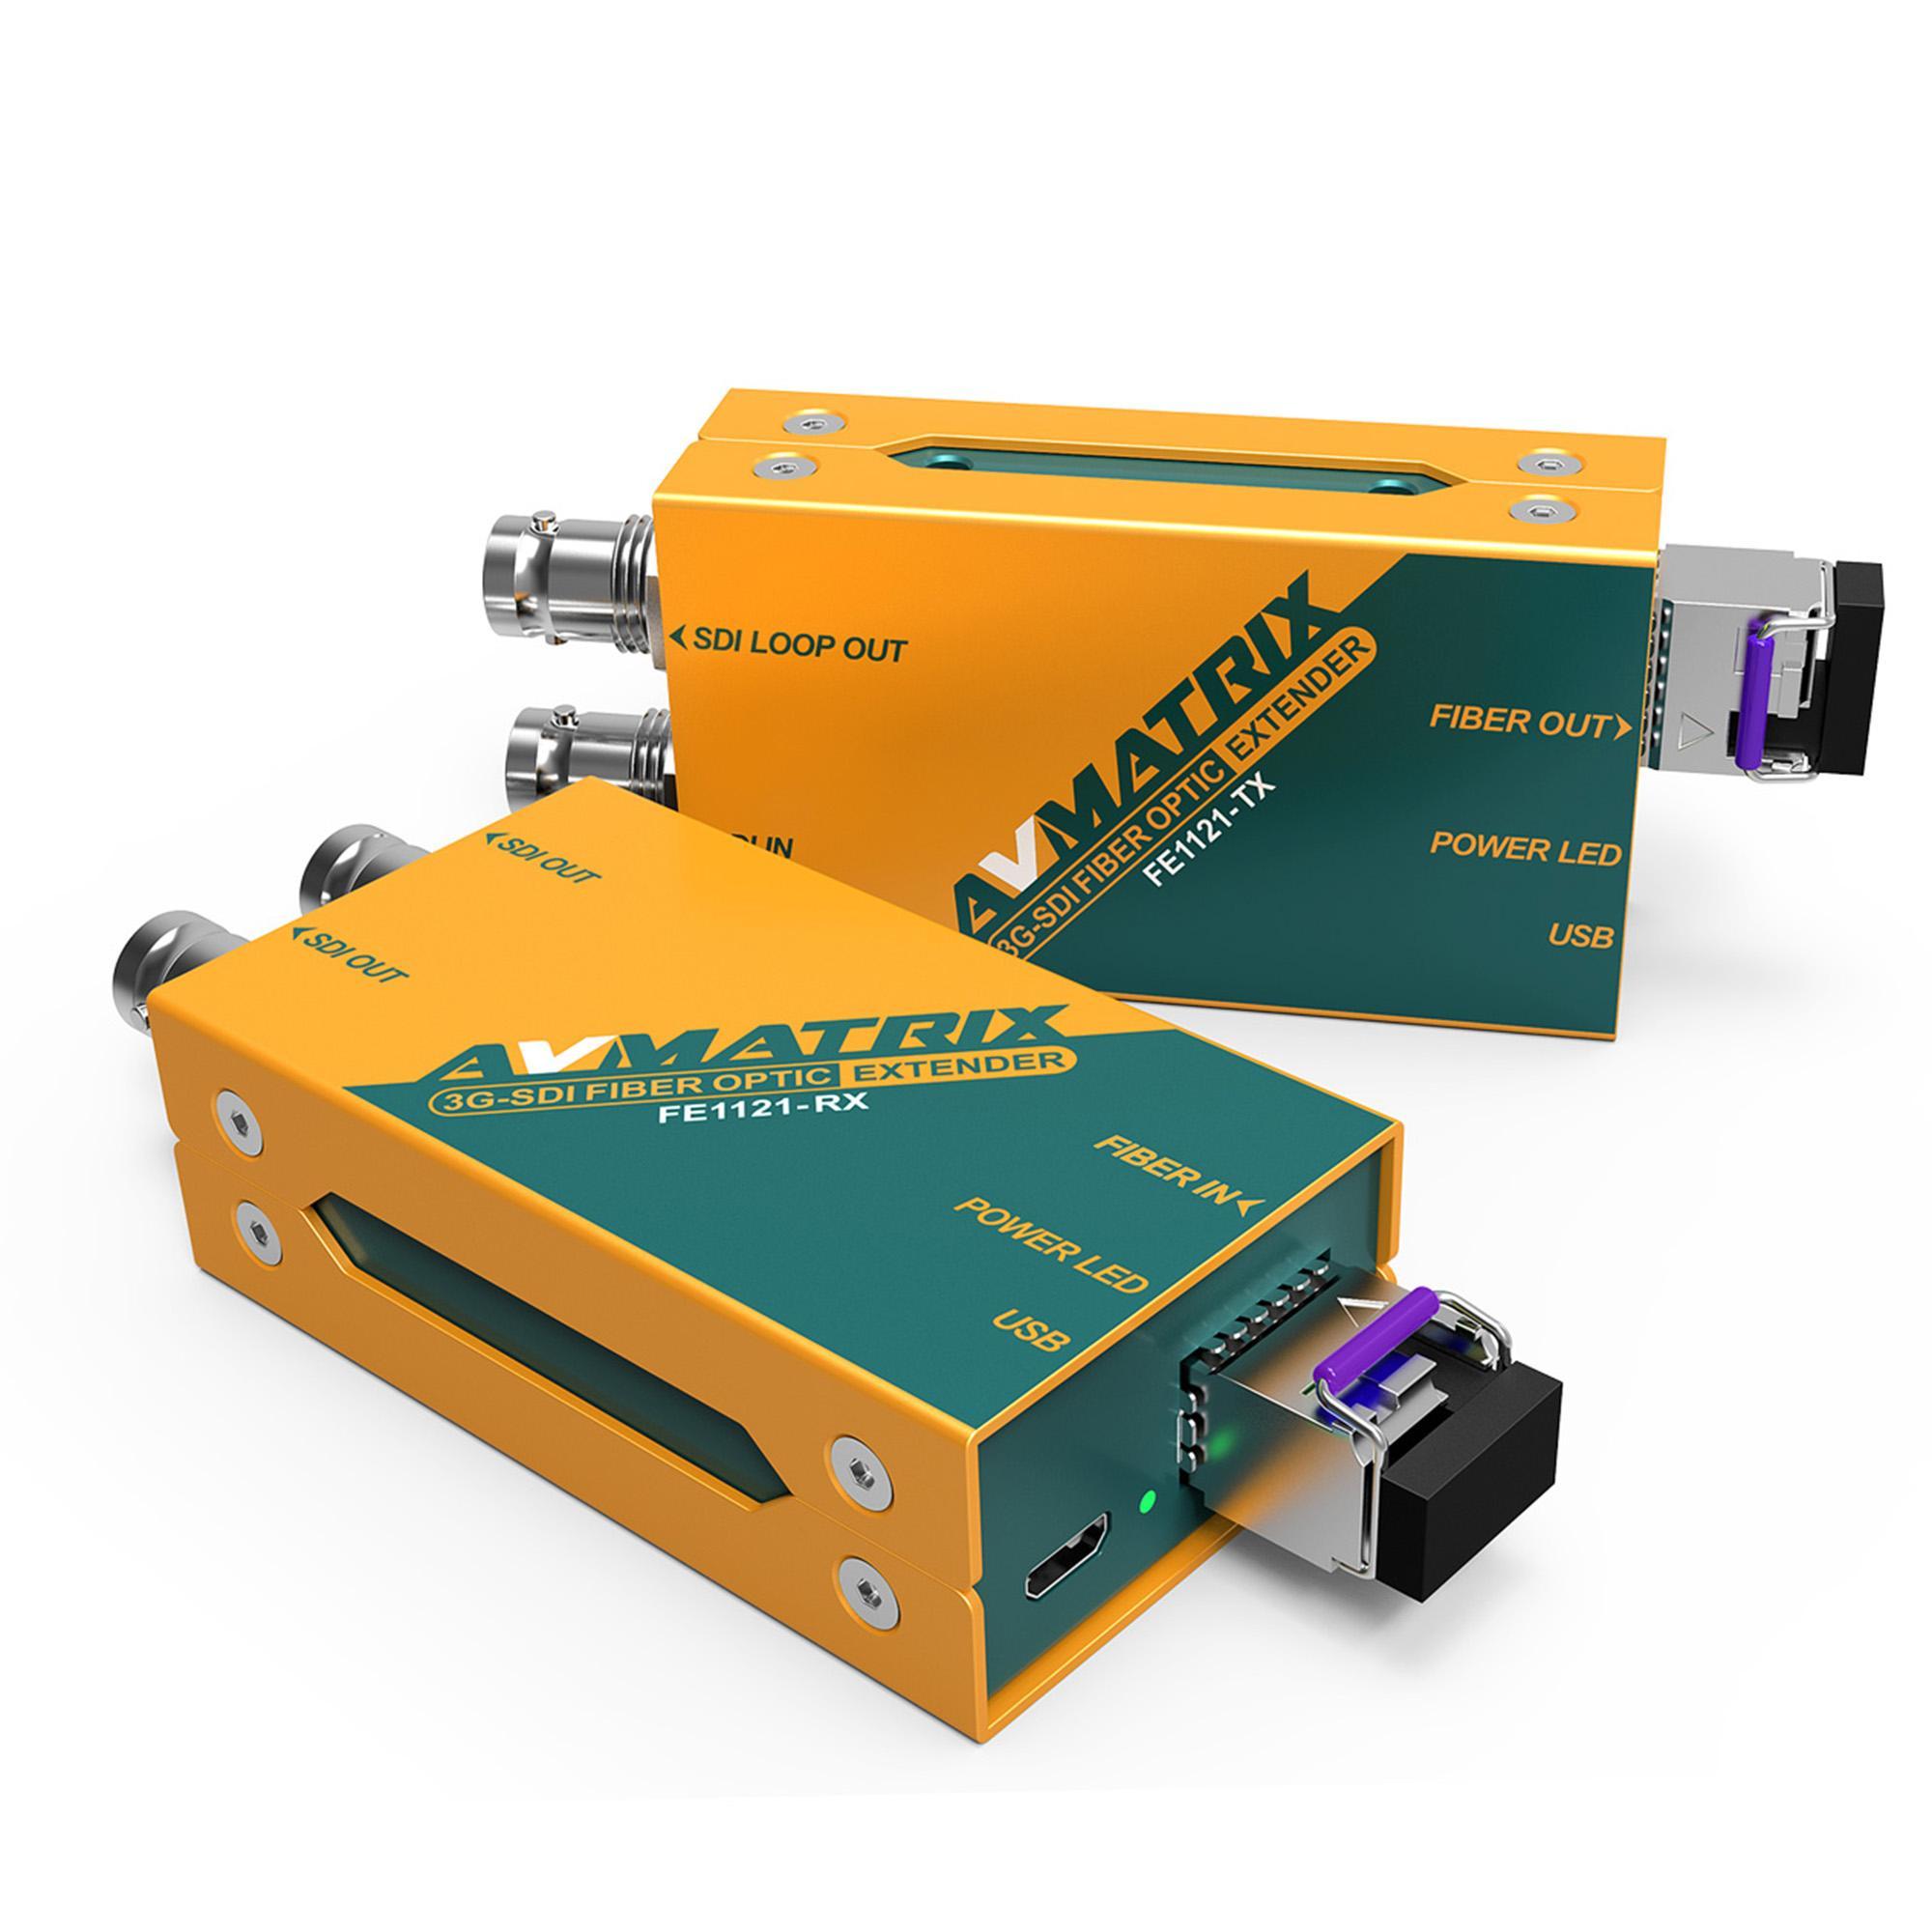 AVMATRIX 3G-SDI FIBER OPTIC EXTENDER